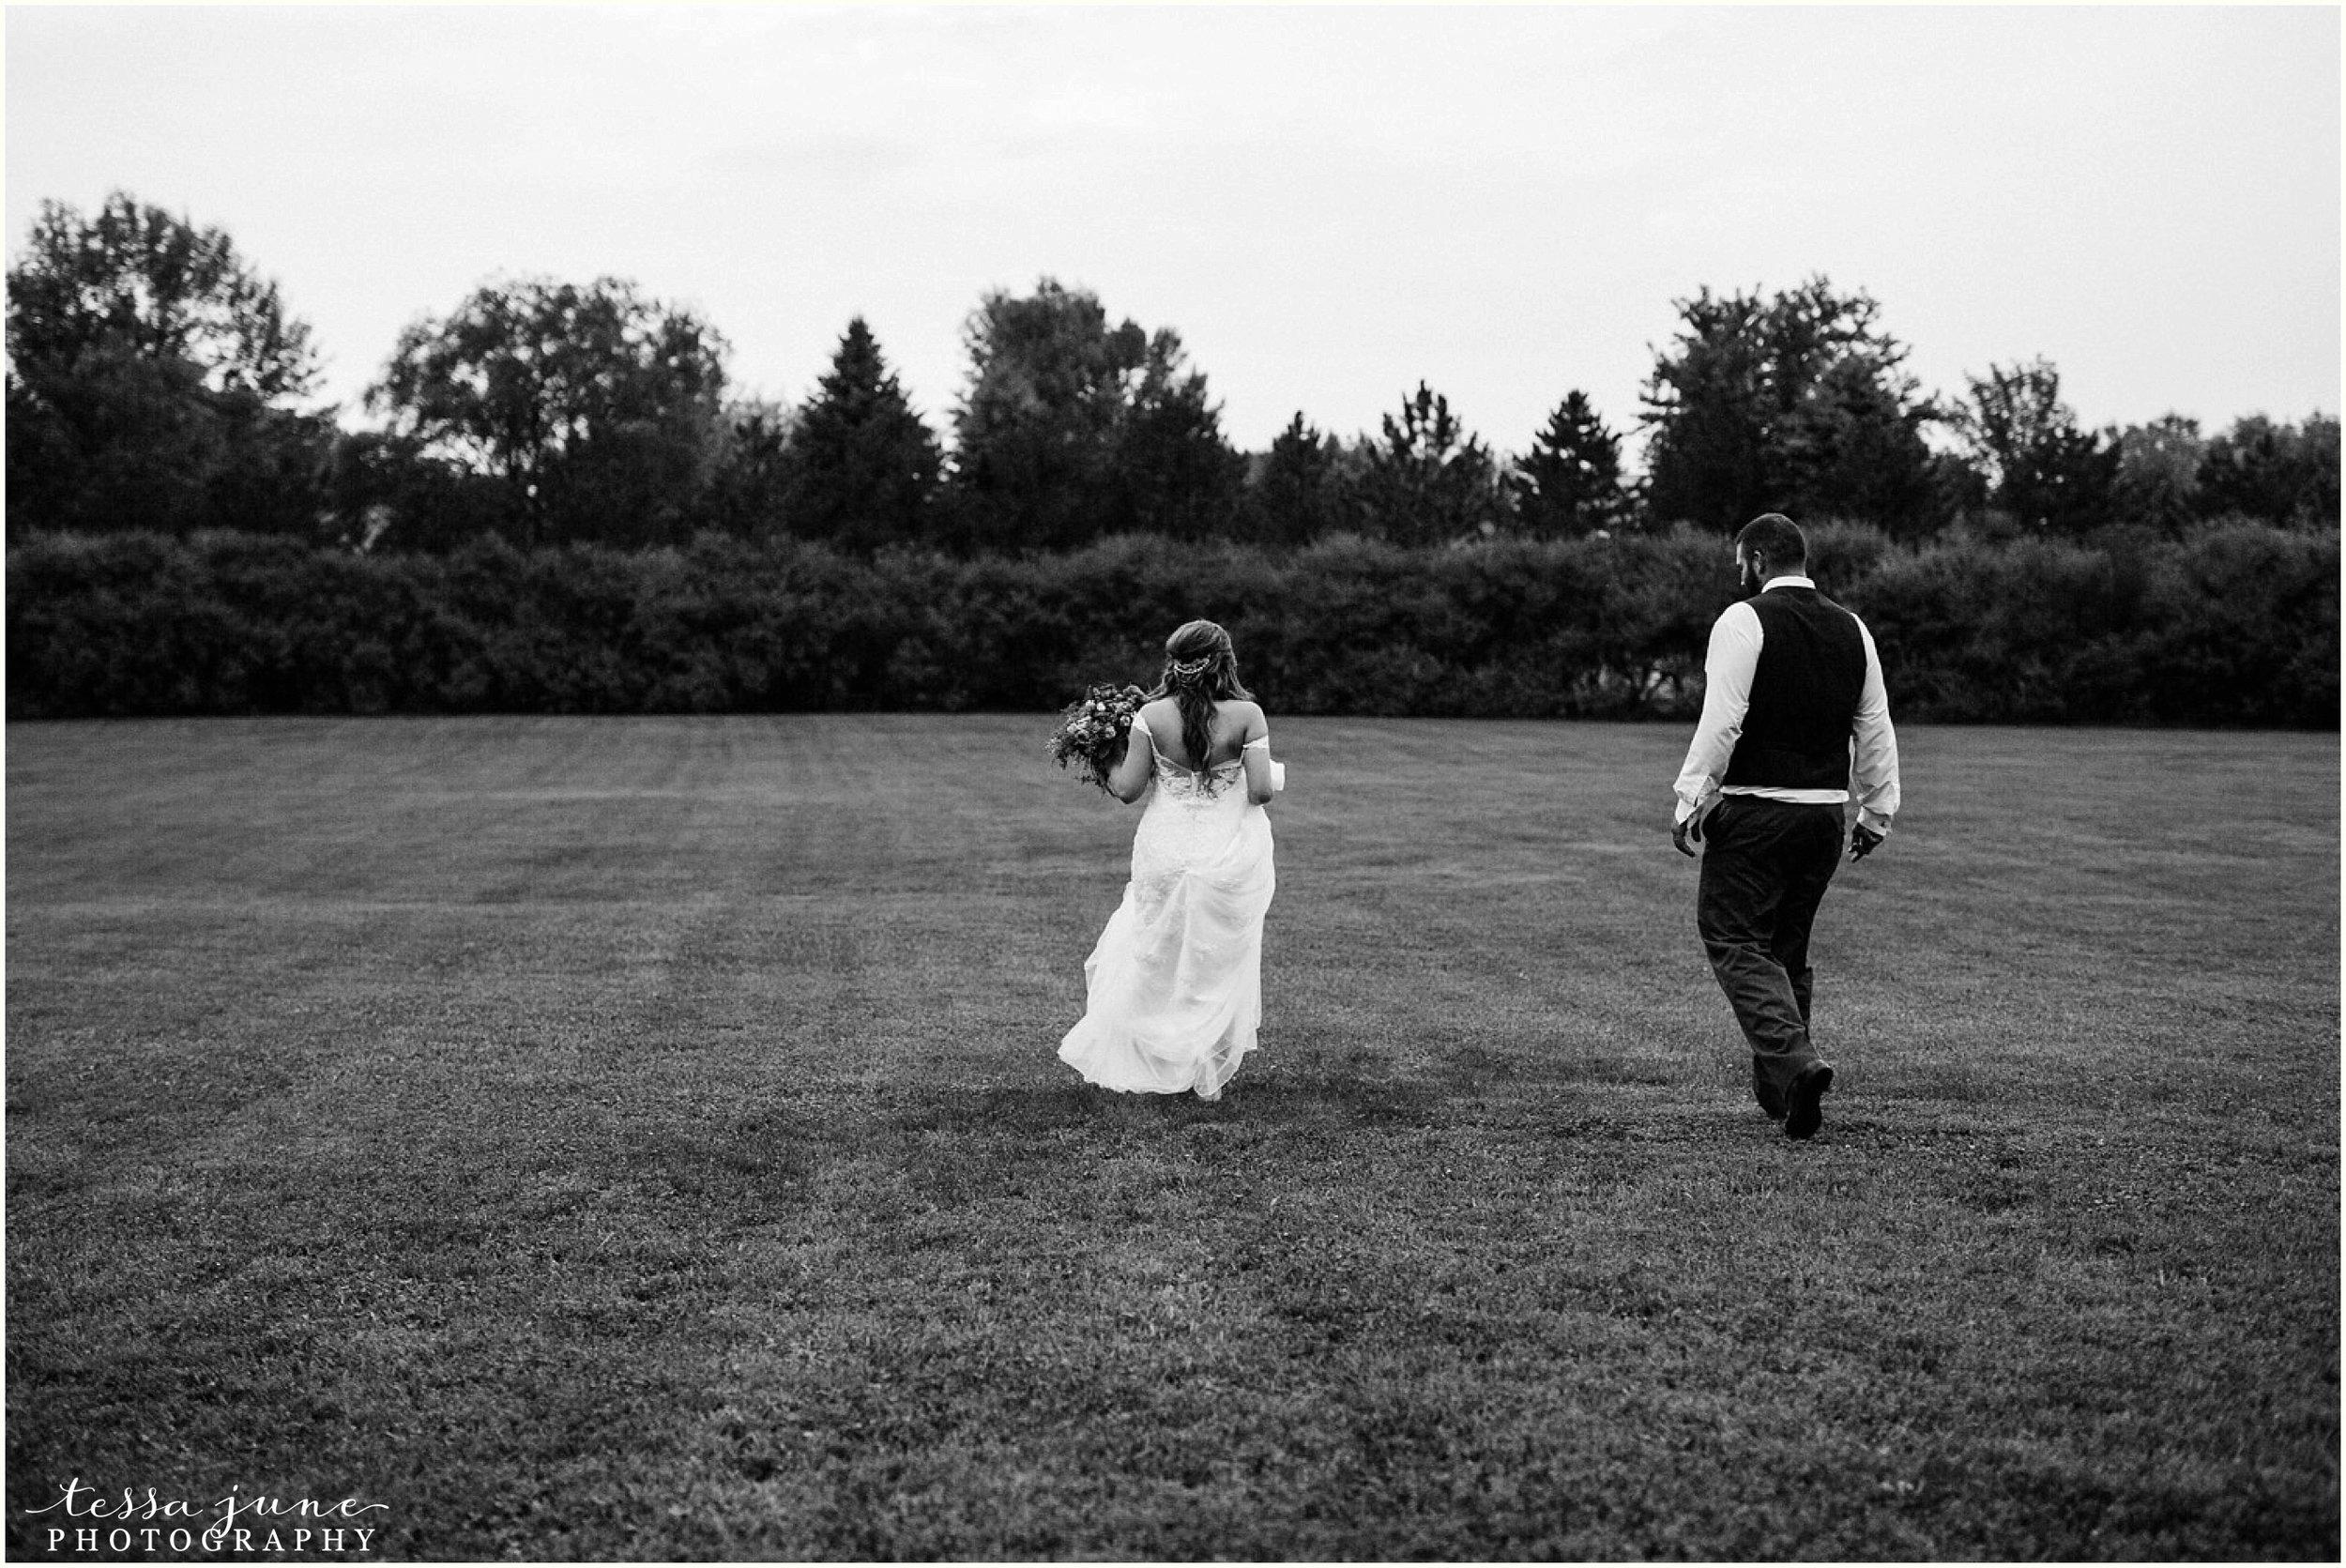 bohemian-minnesota-wedding-mismatched-bridesmaid-dresses-waterfall-st-cloud-tessa-june-photography-178.jpg